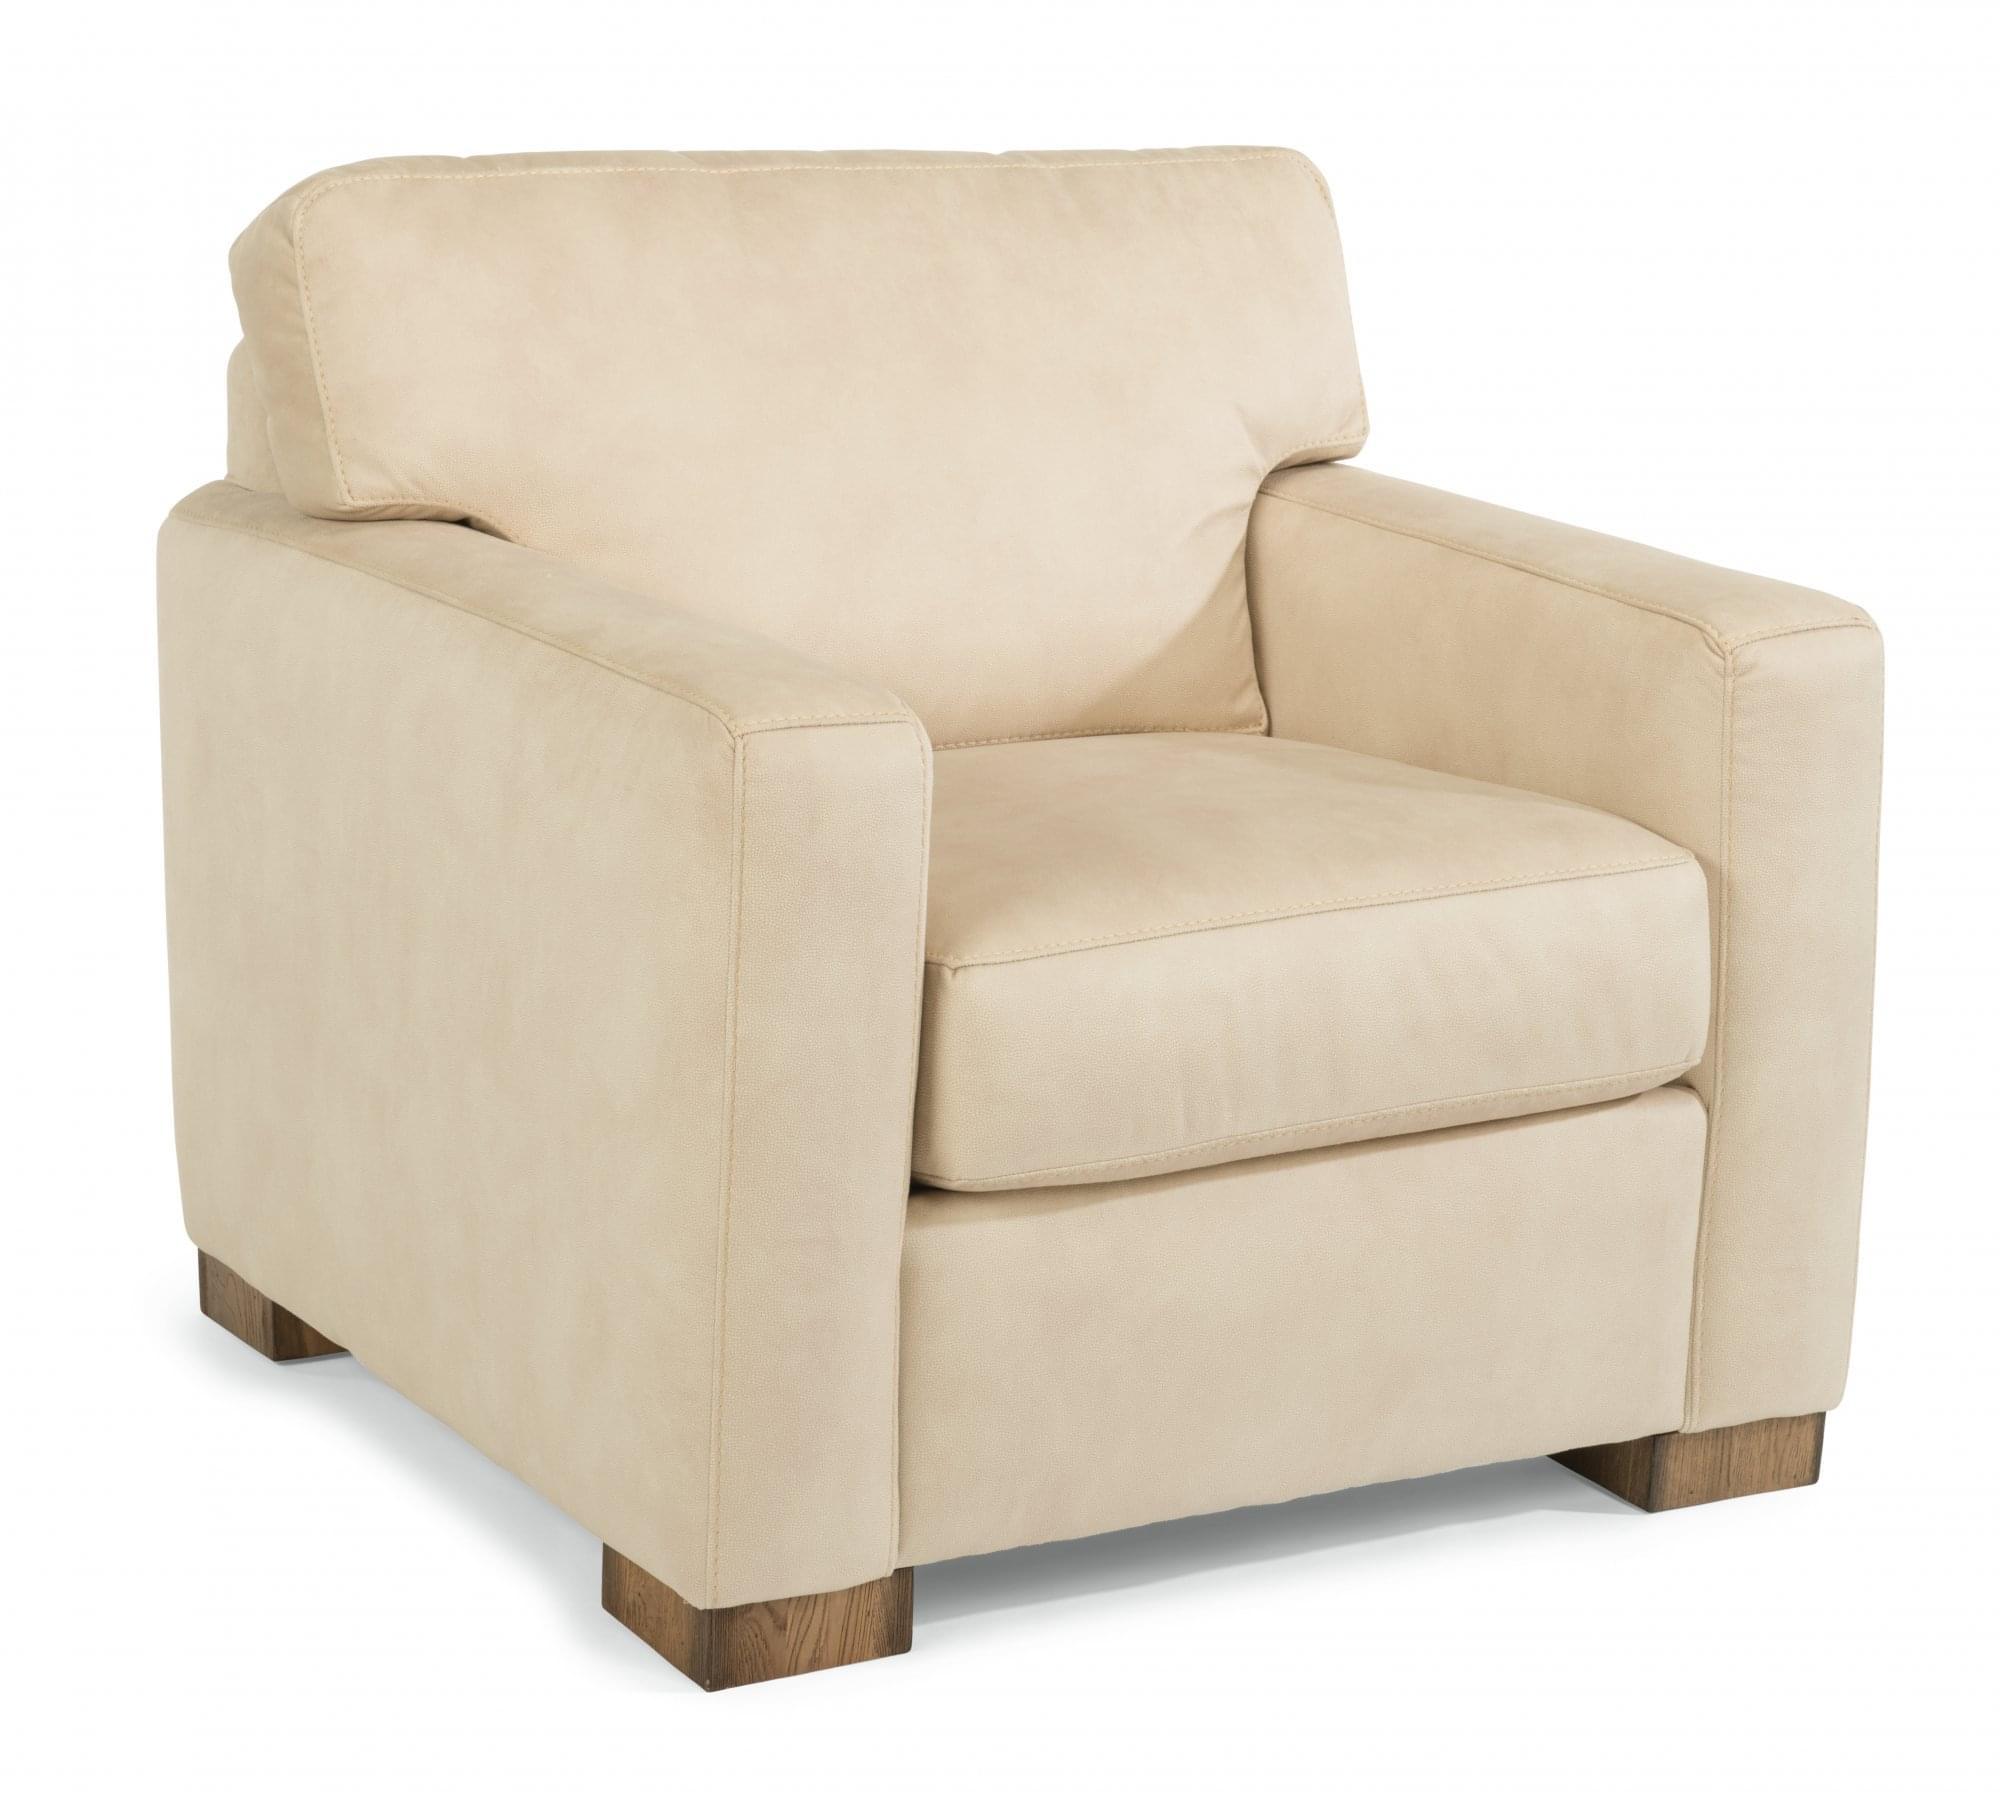 Flexsteel Bryant recliner at Mums Place Furniture Monterey CA